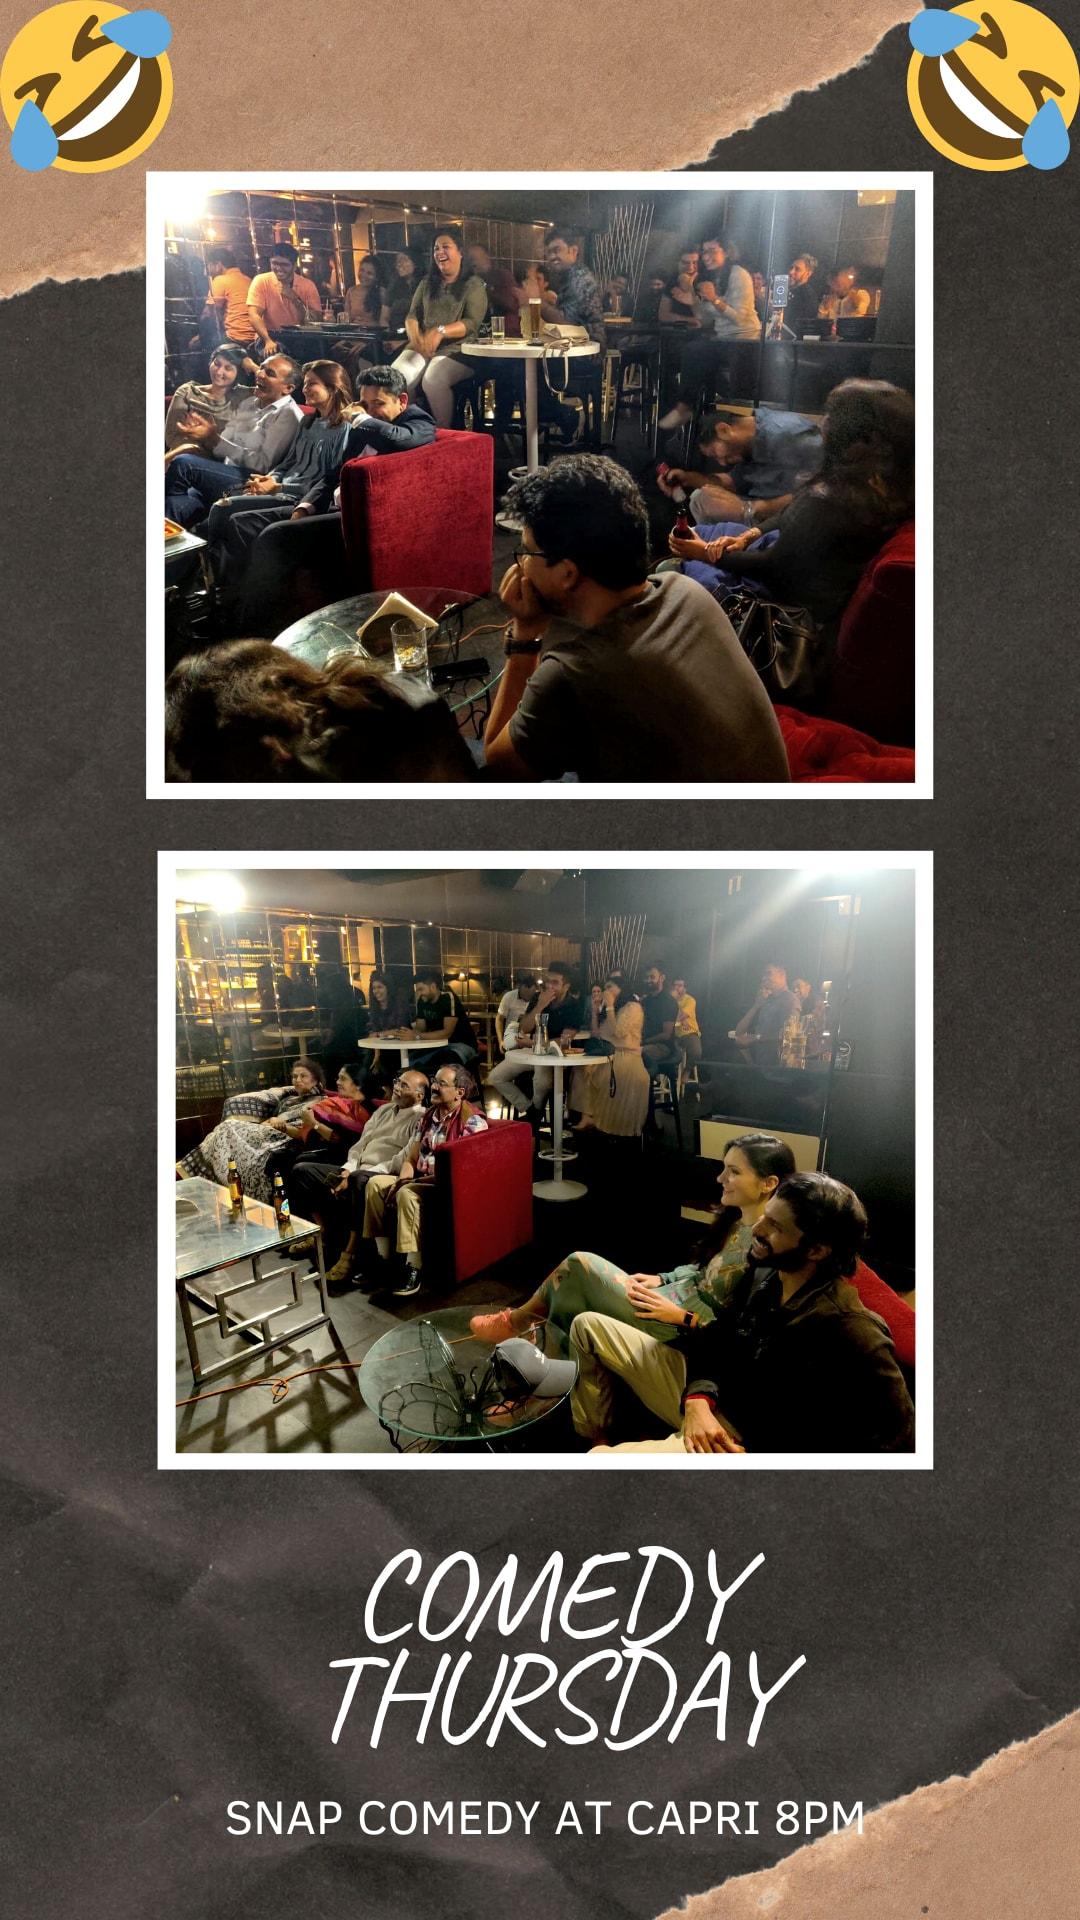 bangalore comedy thursdsay night